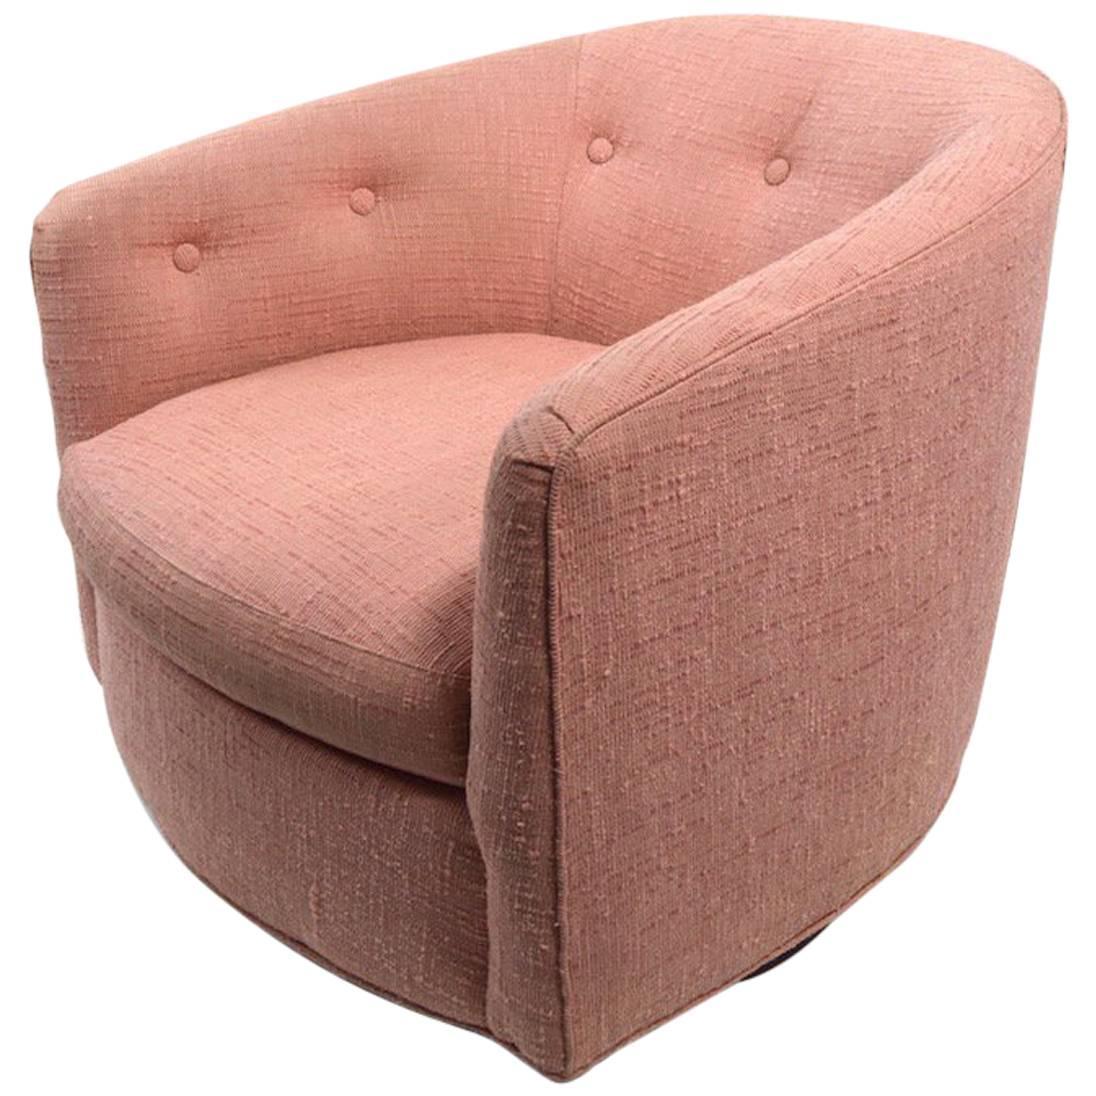 Oversized round swivel lounge chair mid century modern at 1stdibs - Mid Century Fredrik Kayser Swivel Lounge Chair Swivel Tub Chair Attributed To Baughman